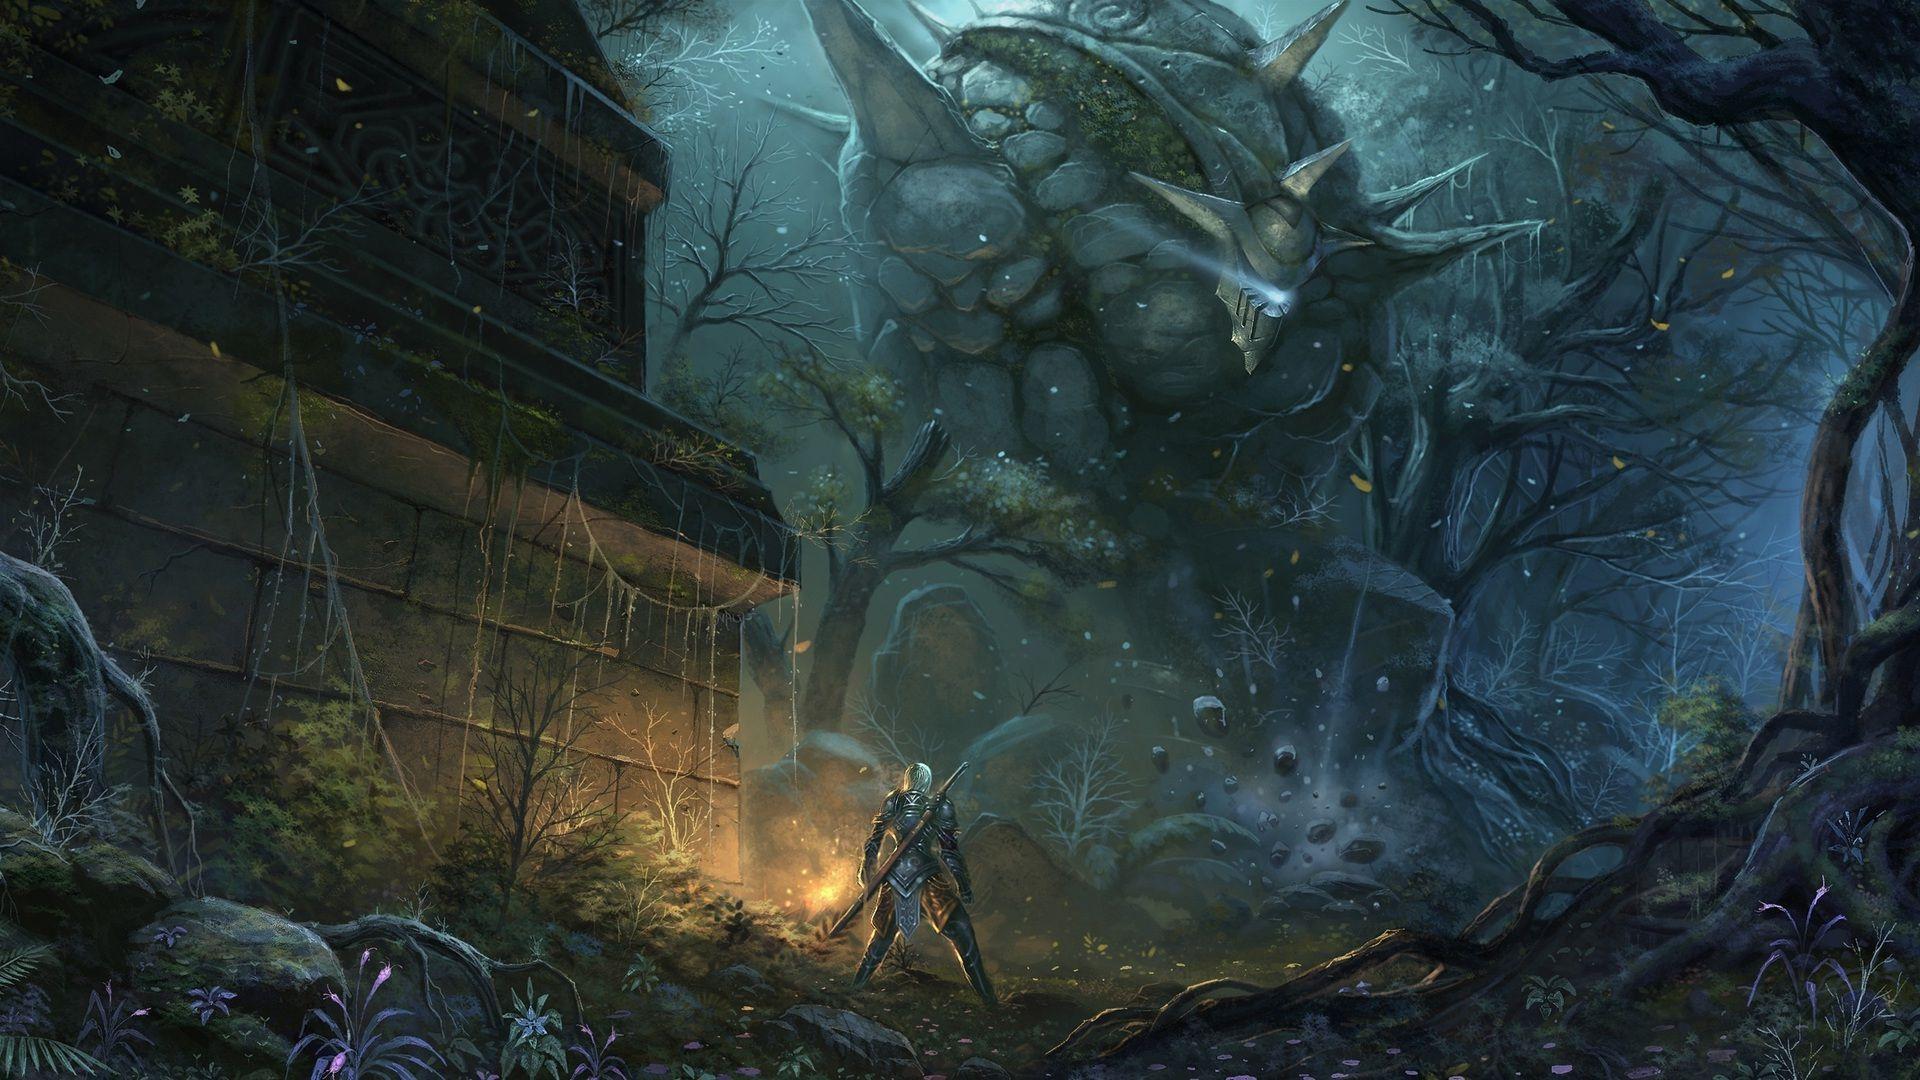 Giant Monster Wallpaper Part 3 Fantasy Pictures Digital Art Fantasy Fantasy Art Fantasy giants wallpapers fantasy